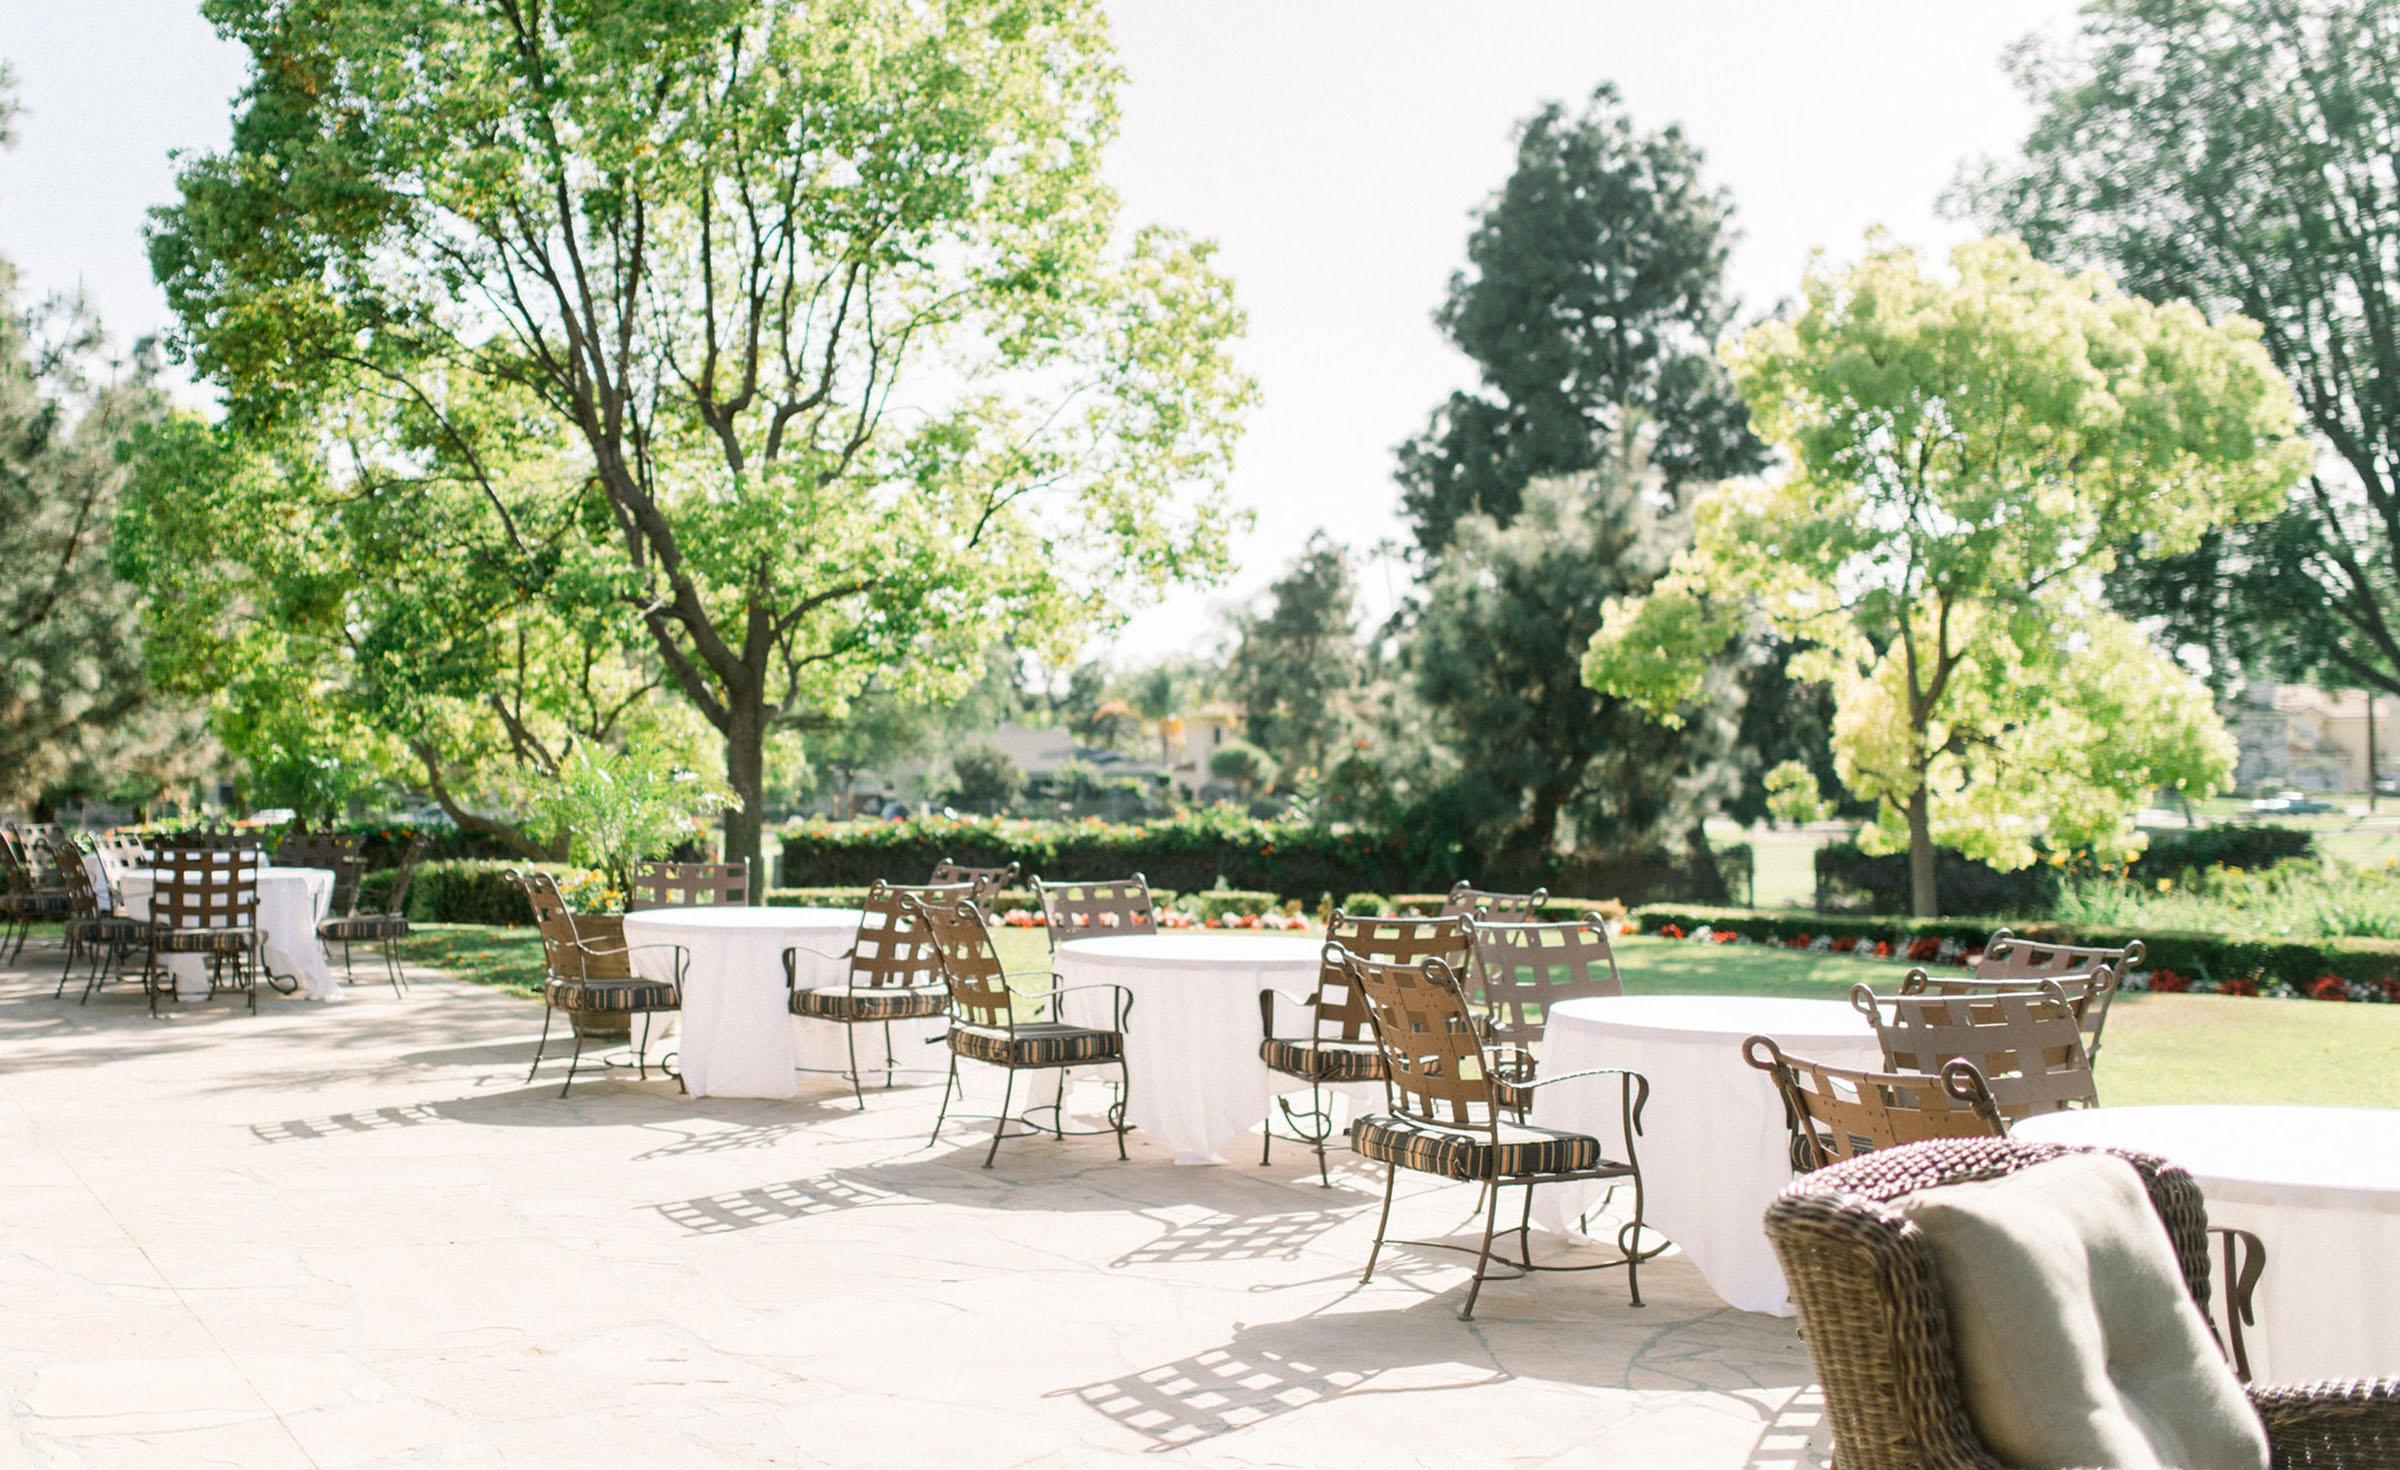 Cocktail Patio - Rio Hondo - Downey, California - Los Angeles County - Wedgewood  Weddings